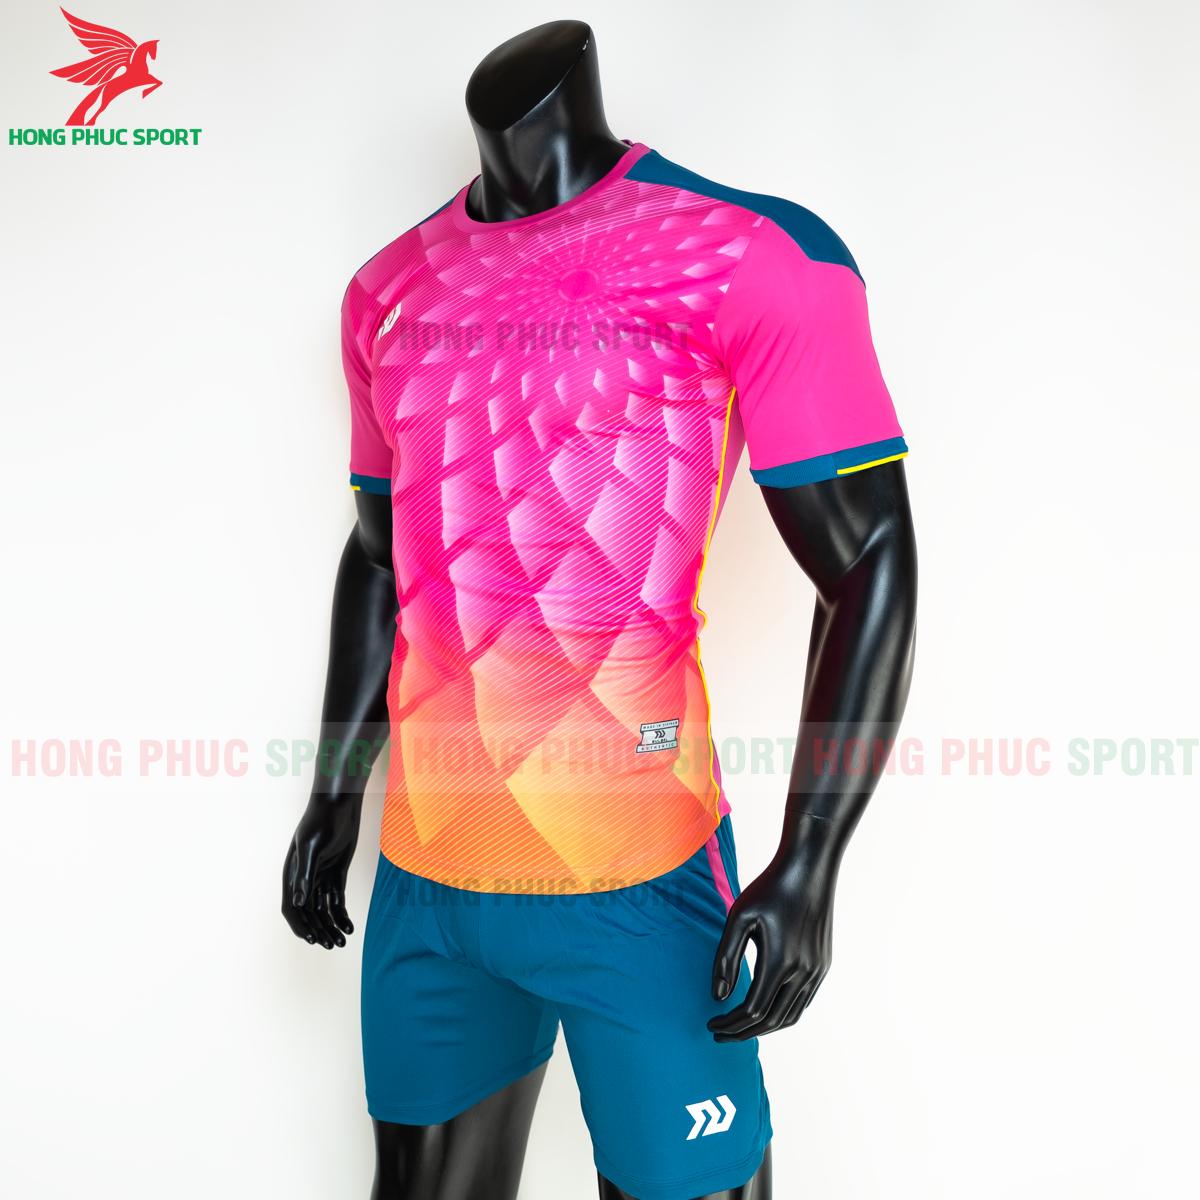 https://cdn.hongphucsport.com/unsafe/s4.shopbay.vn/files/285/ao-bong-da-khong-logo-bulbal-lotus-mau-hong-4-604f399526586.png